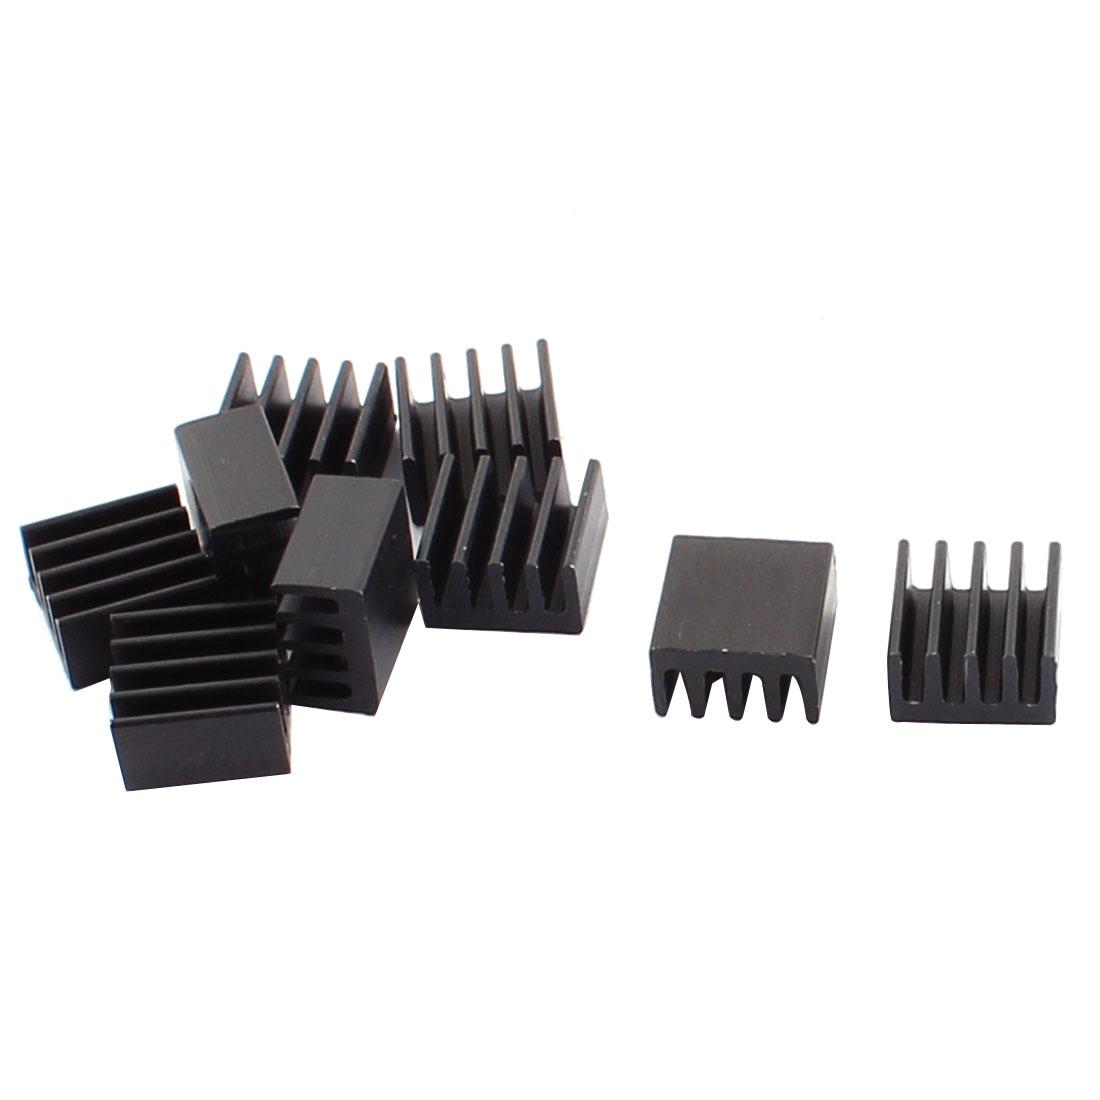 10pcs Aluminium 8.8x8.8x5mm Heatsink Heat Sink Diffuse Cooling Cooler Fin Black